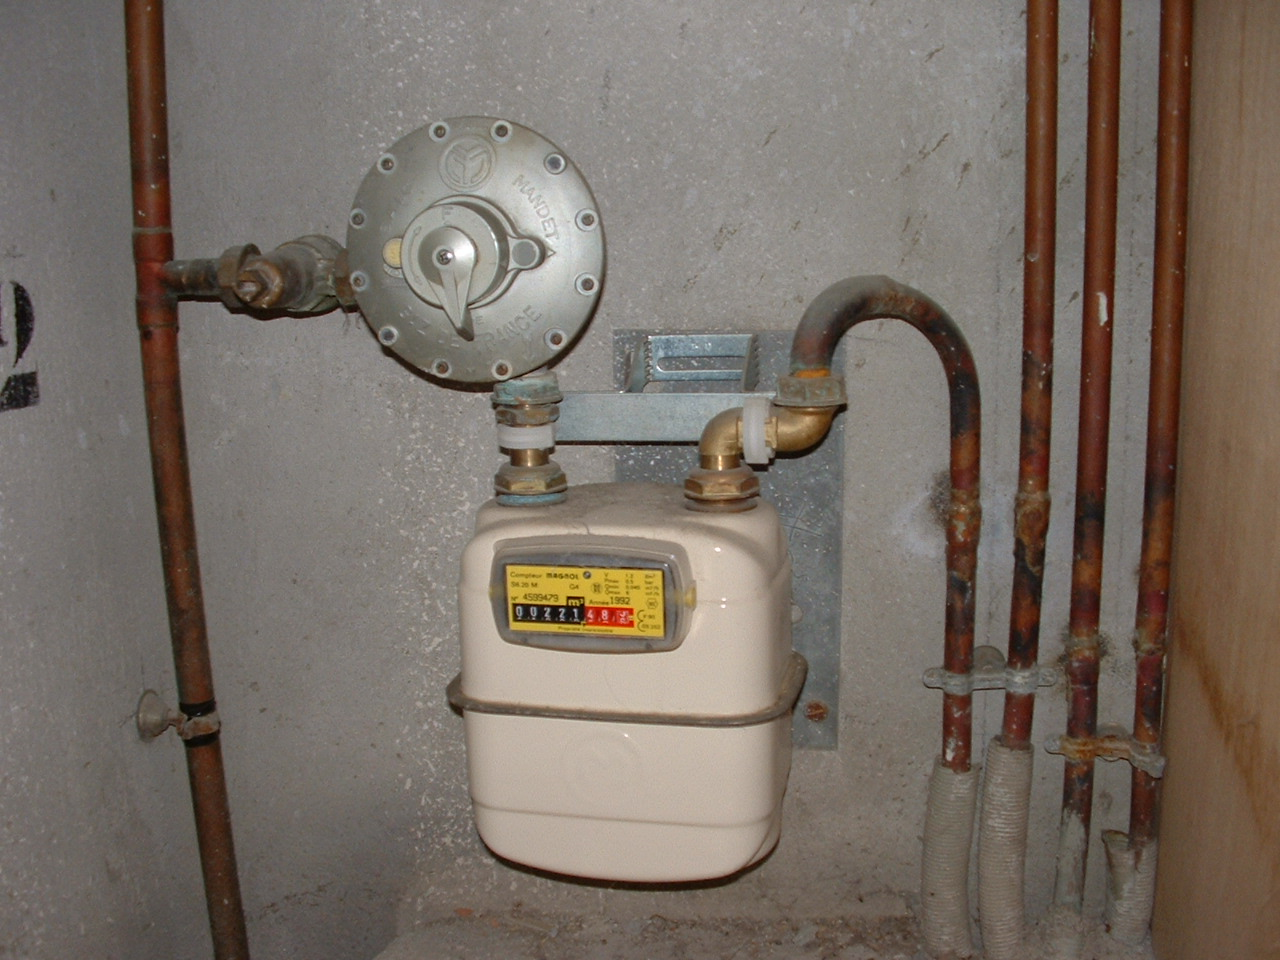 Pin compteur gaz on pinterest - Installation compteur gaz ...